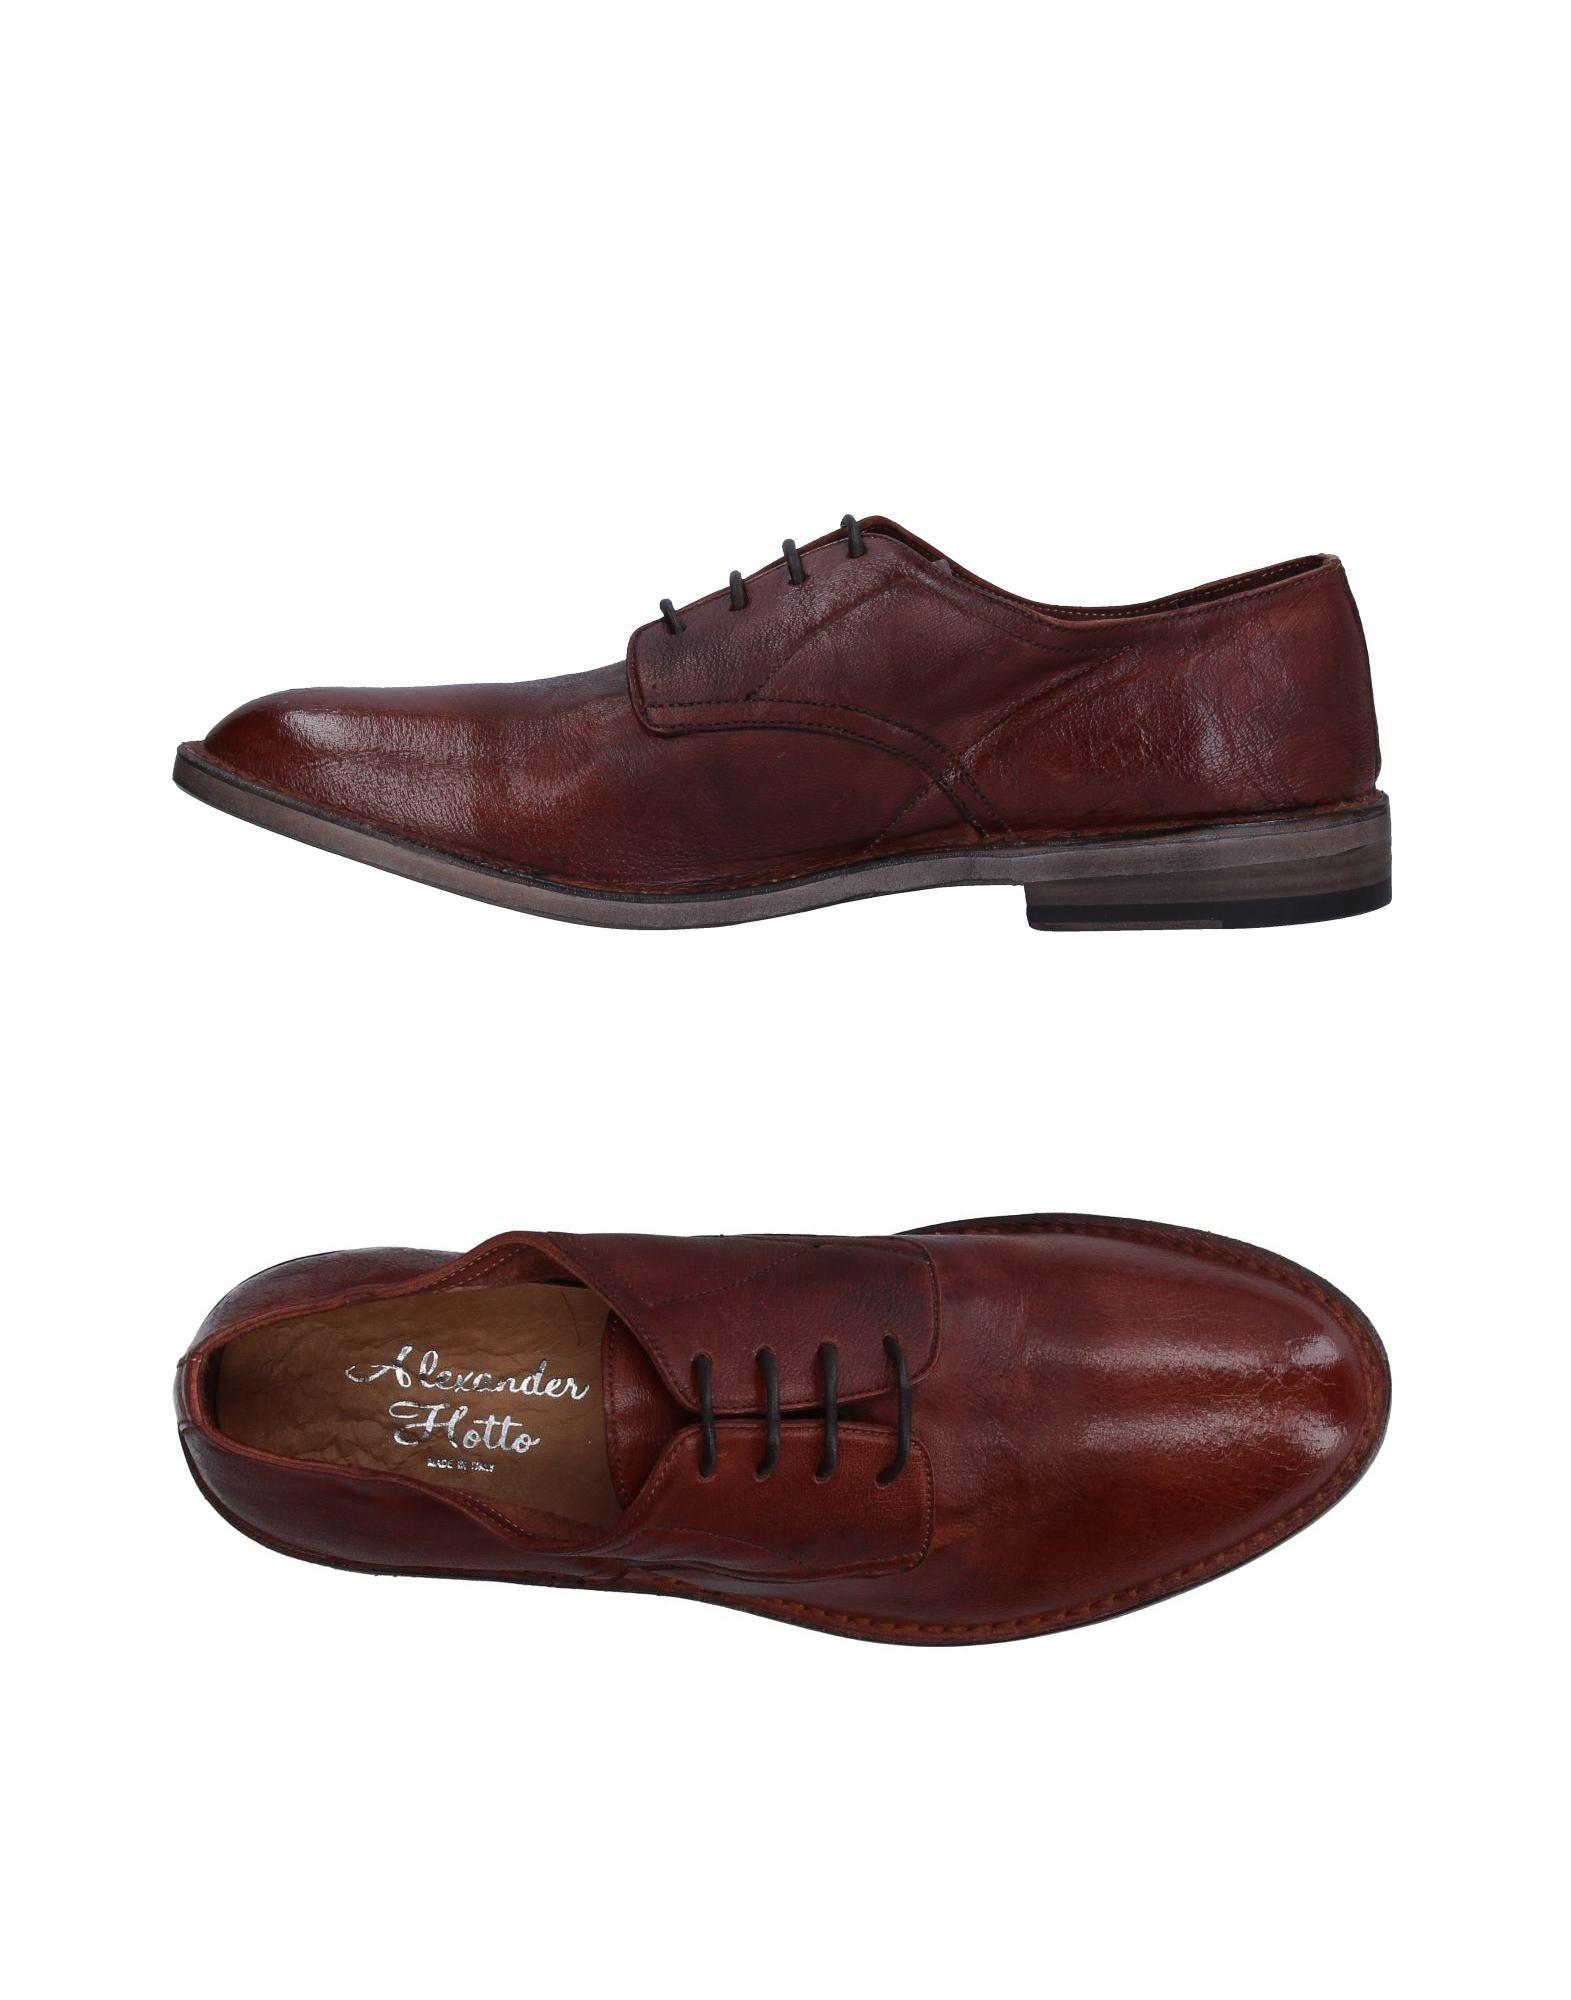 Rabatt echte Schuhe Alexander Hotto Schnürschuhe Herren  11332927KG